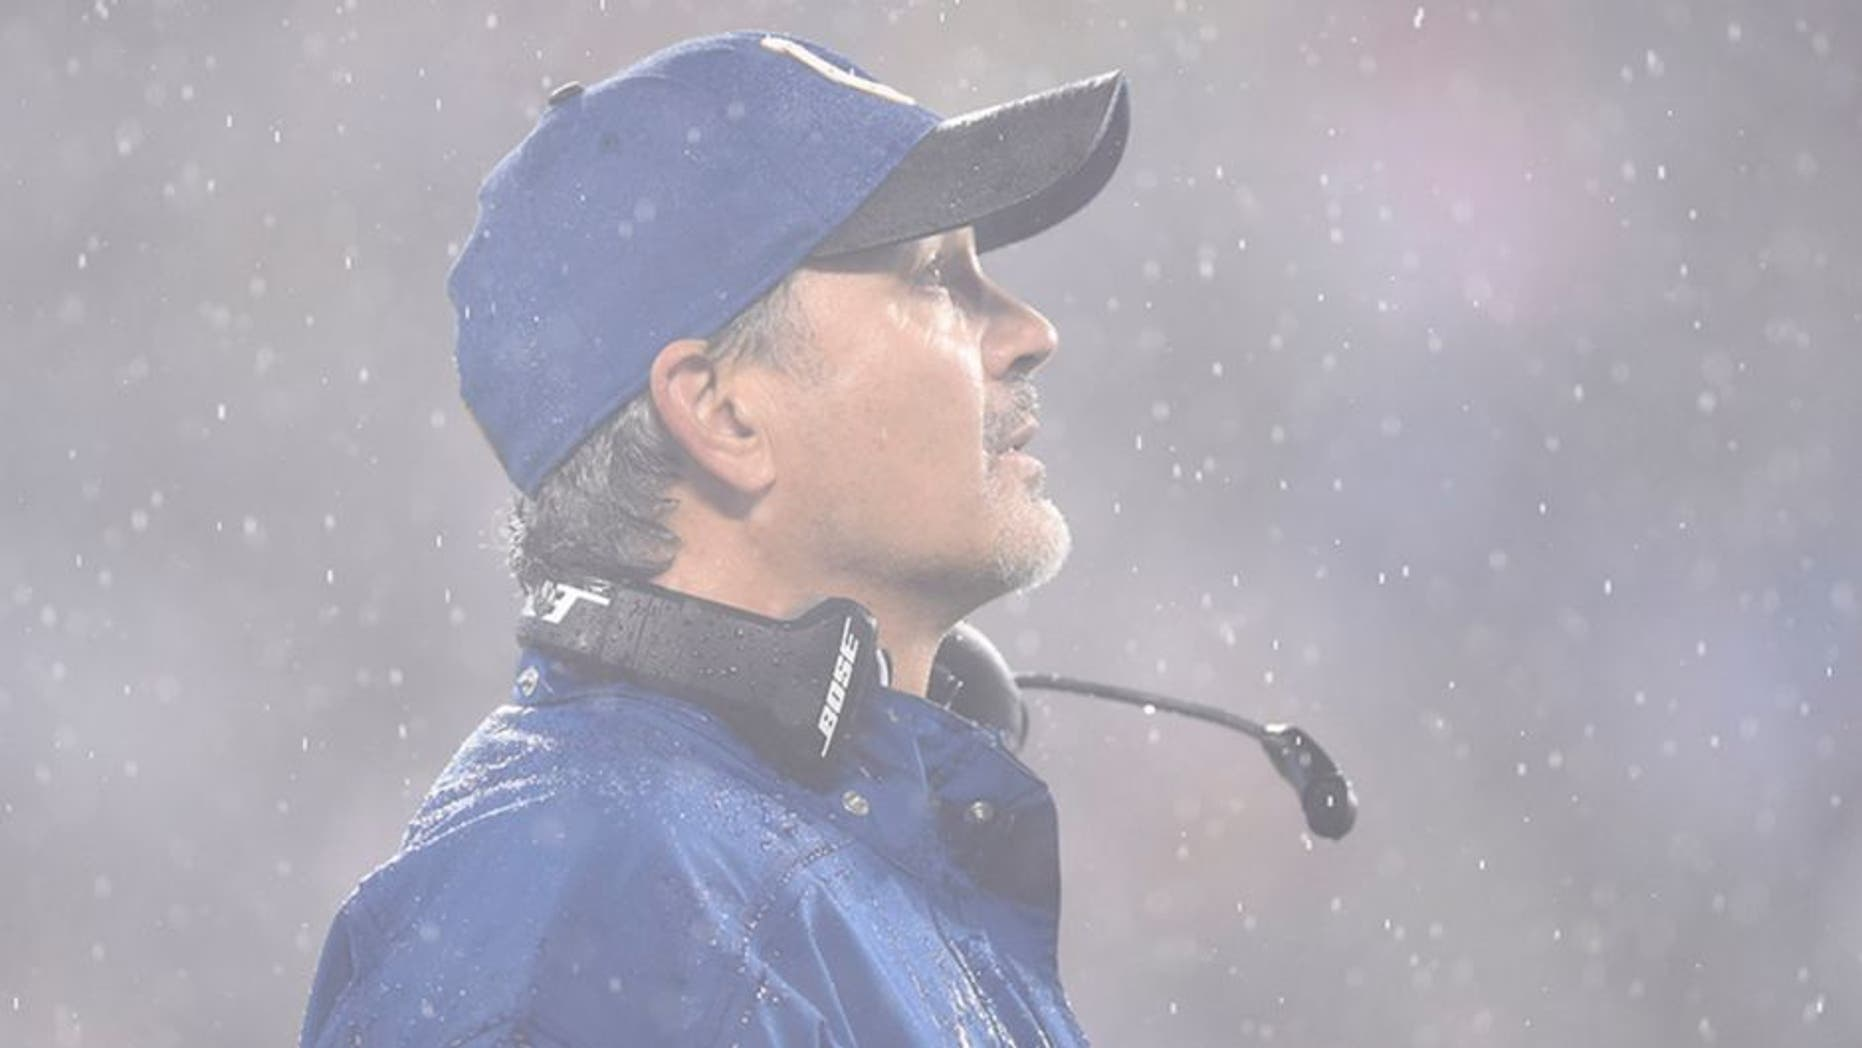 Nov 2, 2015; Charlotte, NC, USA; Indianapolis Colts head coach Chuck Pagano in the second quarter at Bank of America Stadium. Mandatory Credit: Bob Donnan-USA TODAY Sports